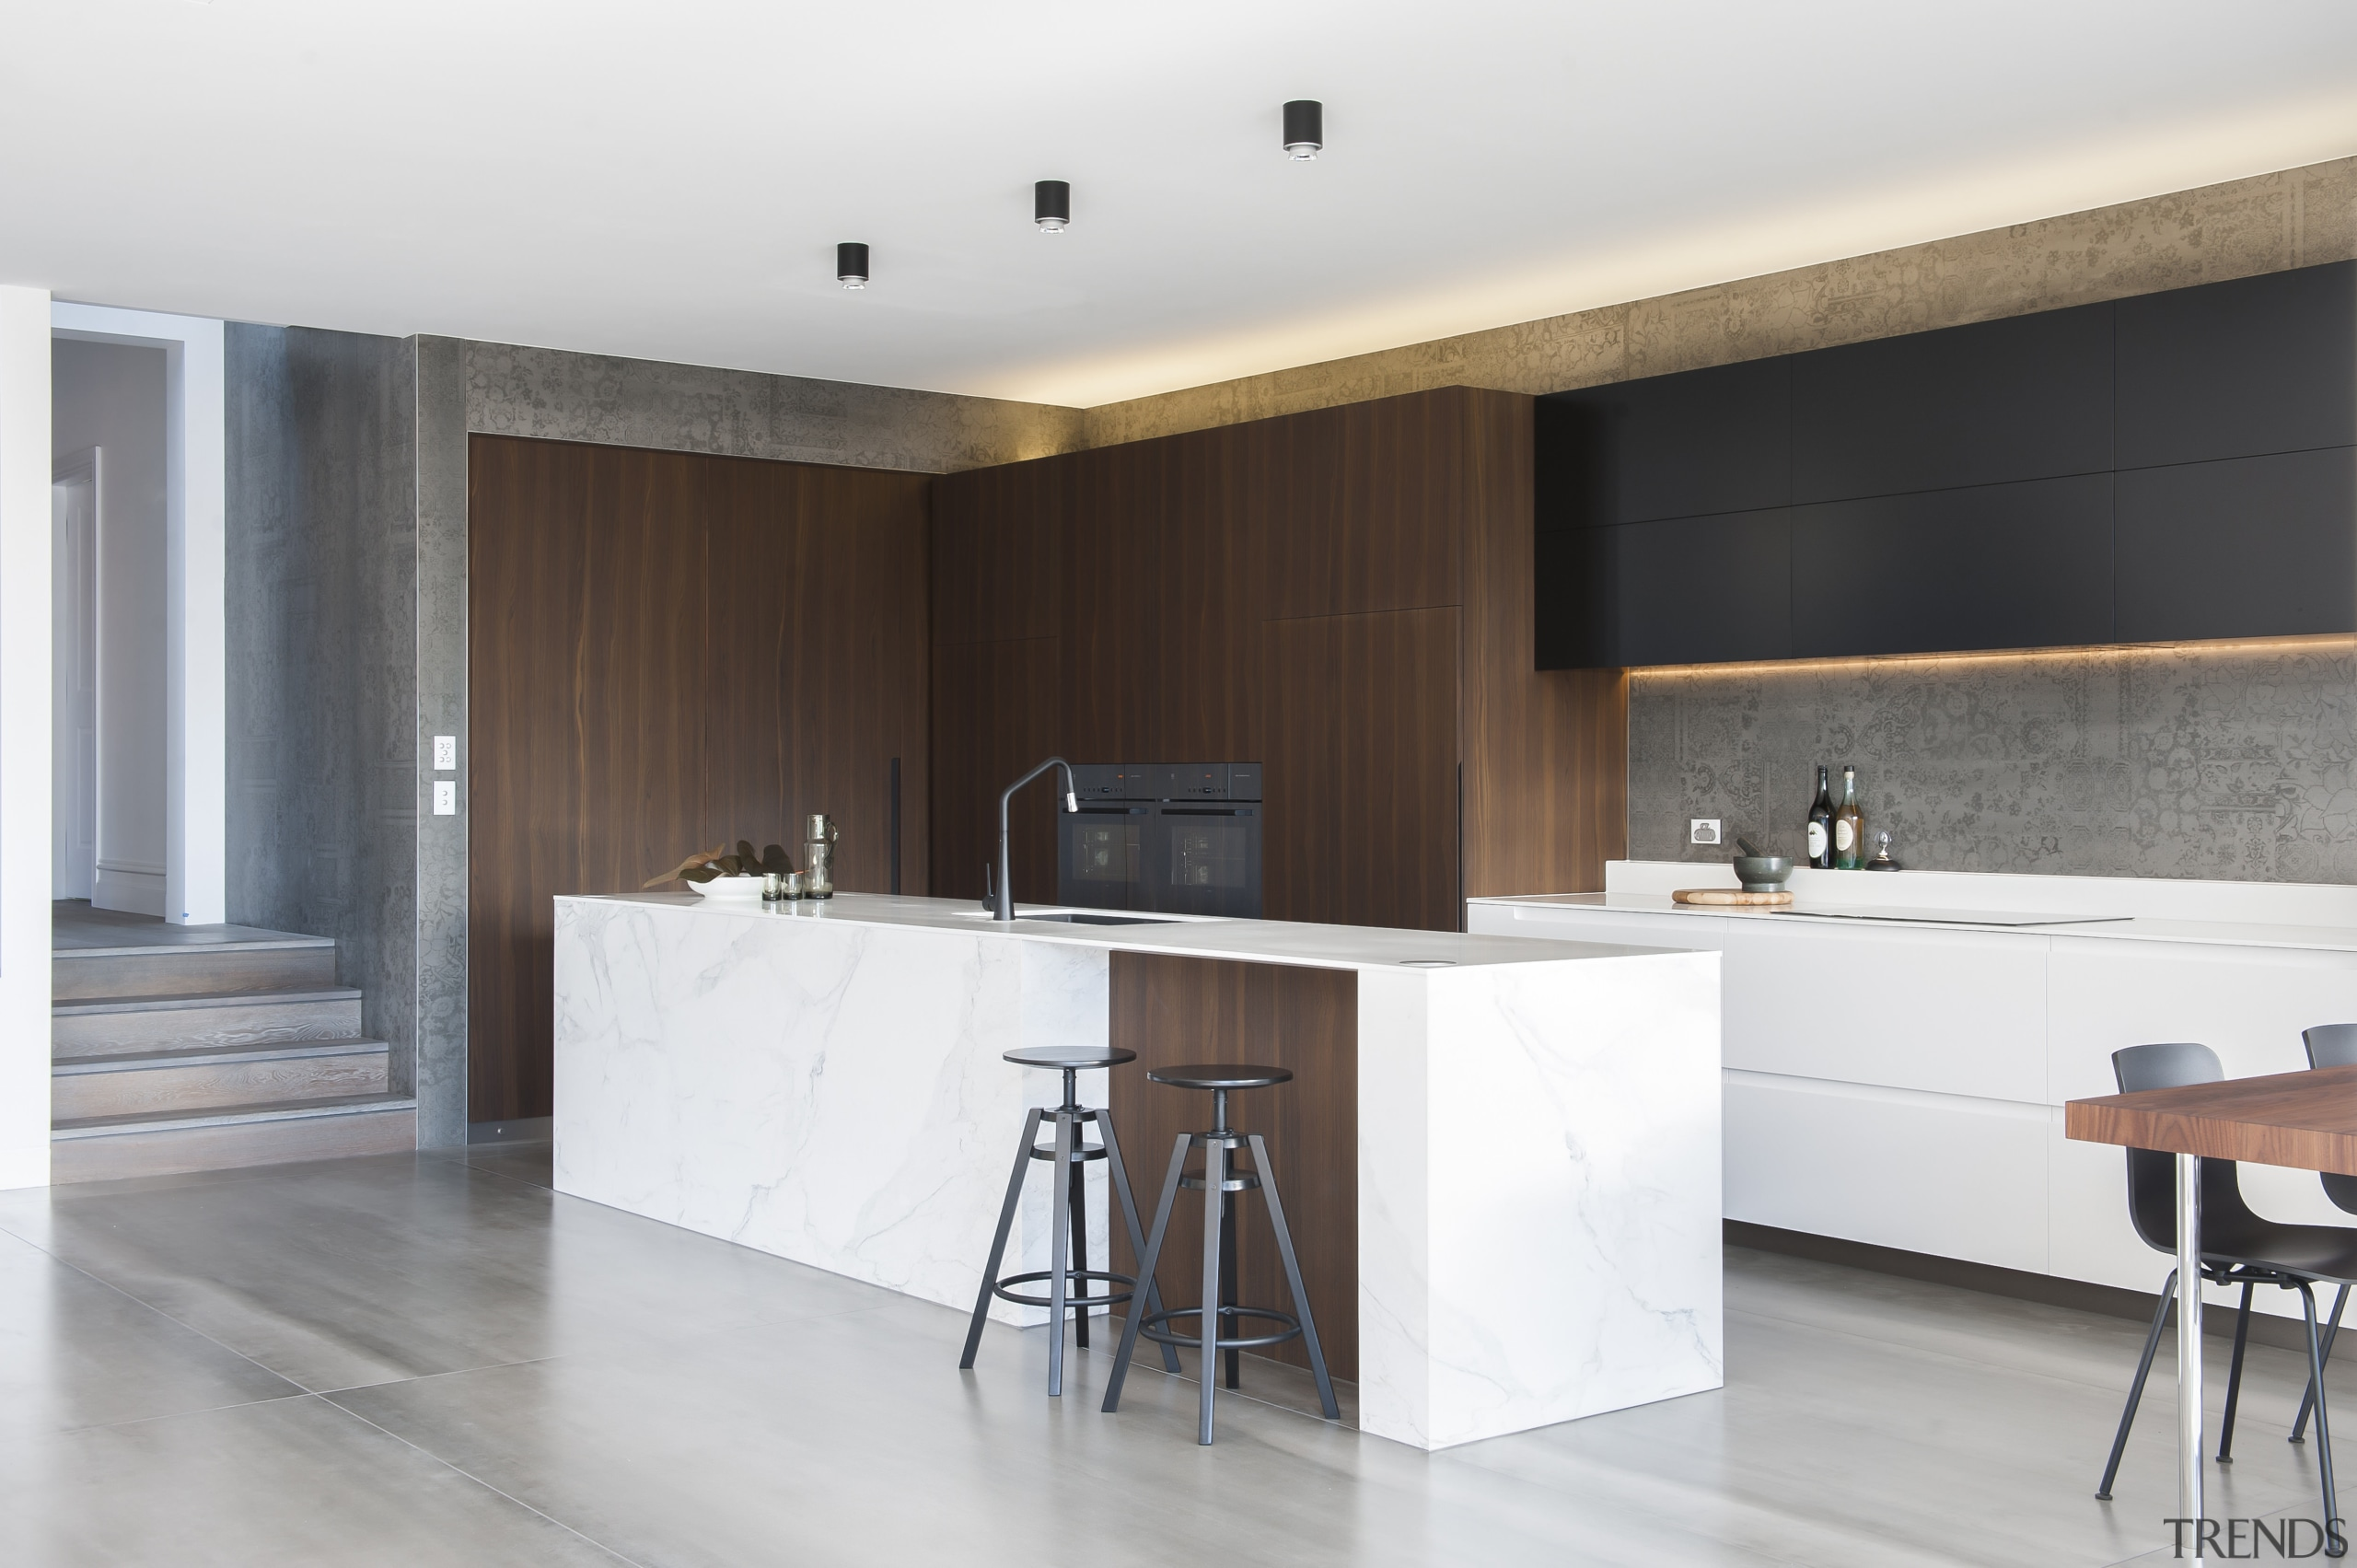 This kitchen is an elegant composition of crisp, architecture, cabinetry, countertop, cuisine classique, floor, flooring, interior design, kitchen, room, wood flooring, white